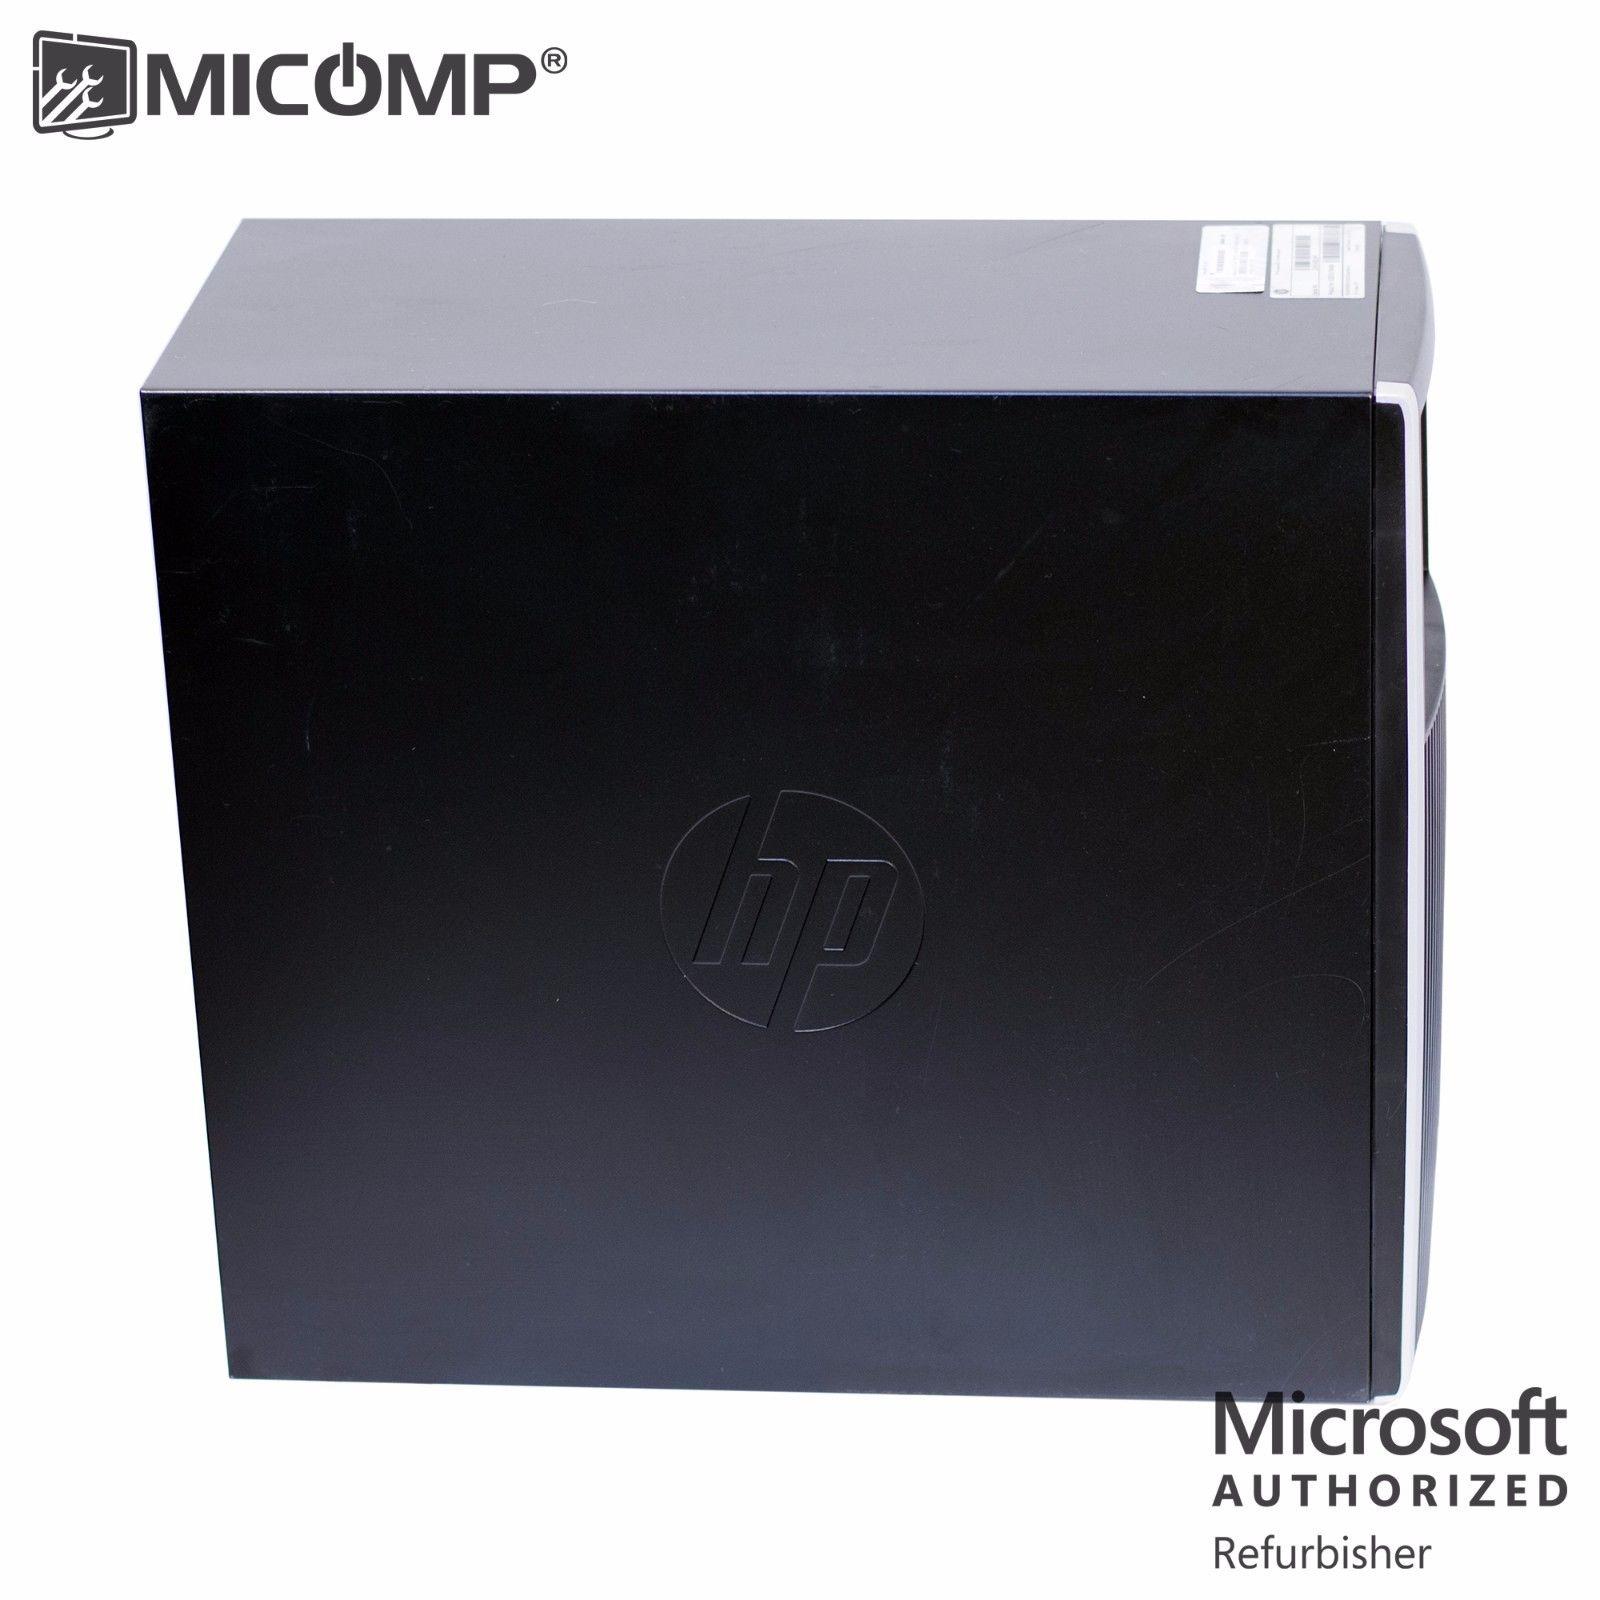 HP Gaming Computer Nvidia GTX 1050 Video Core i5 3.2Ghz 16Gb 1TB HDD Windows 10 HDMI WiFi 1 Year Warranty 2